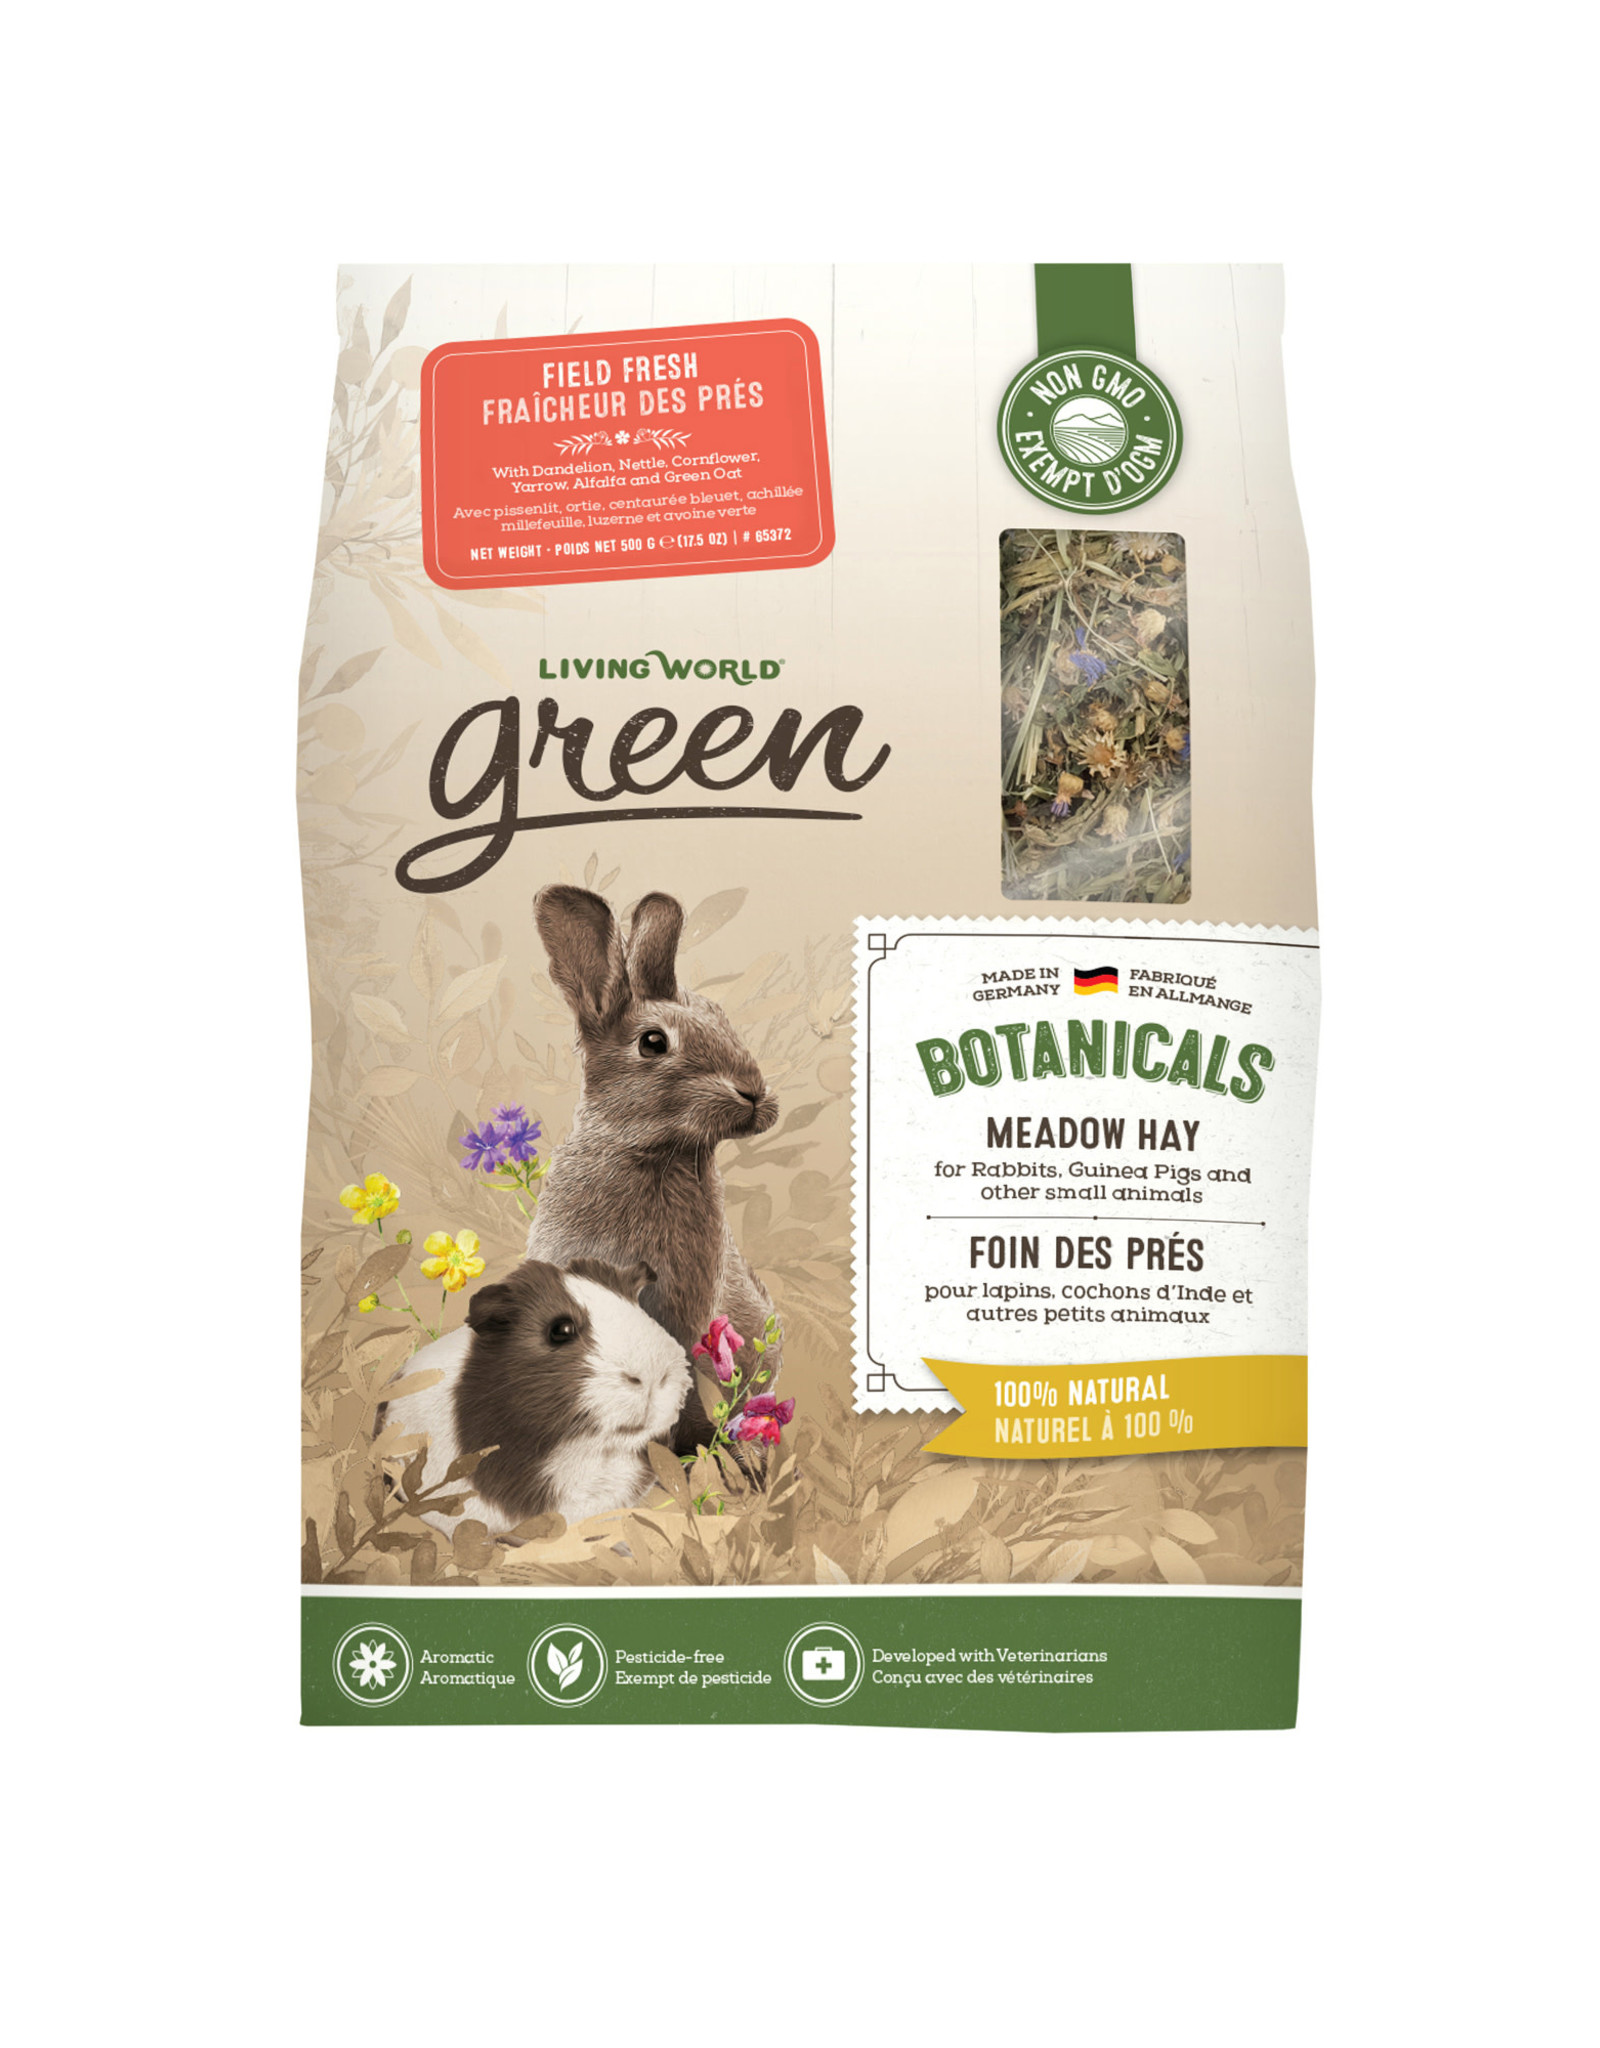 LIVING WORLD Living World Green Botanicals Meadow Hay - Field Fresh - 500 g